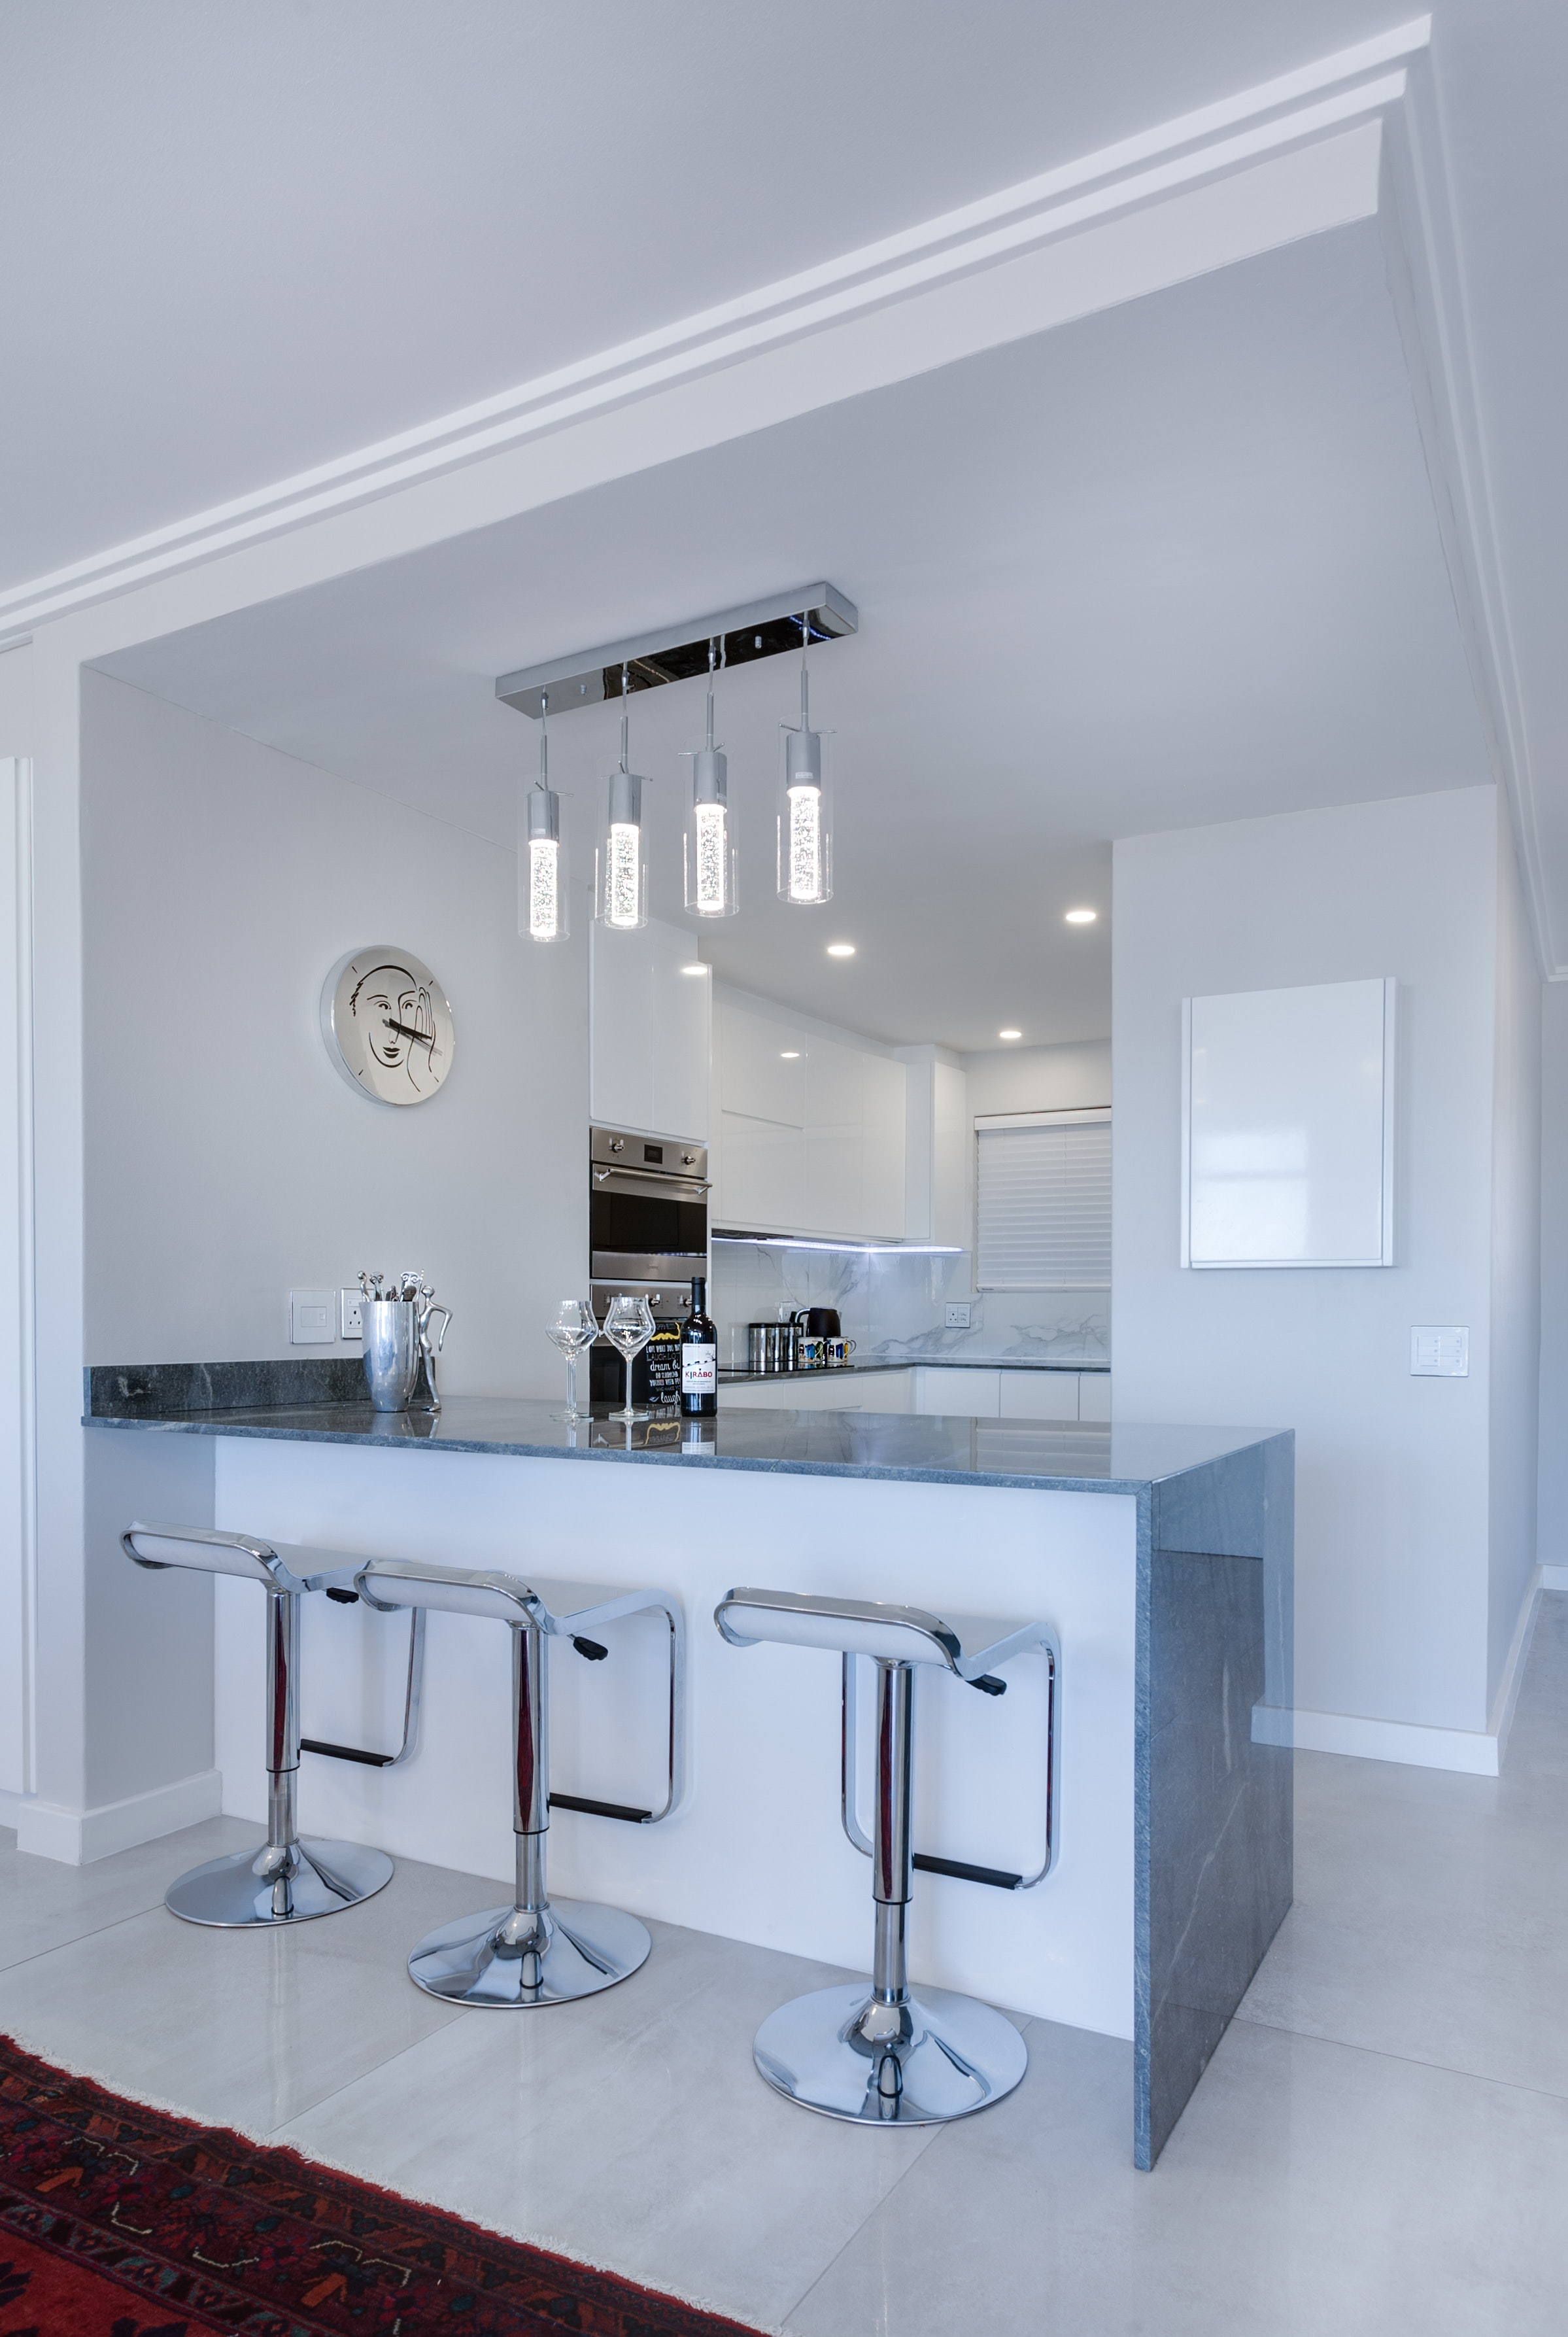 apartment-architecture-clean-1454805.jpg